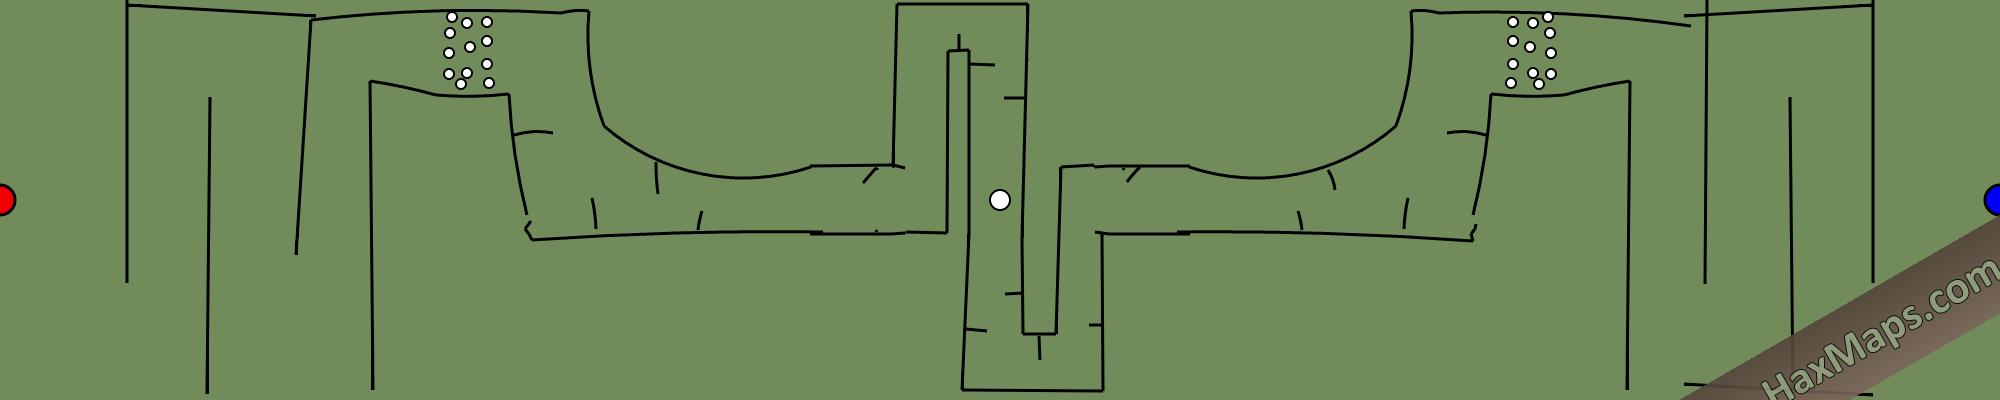 hax ball maps | GraelSurvivor 1